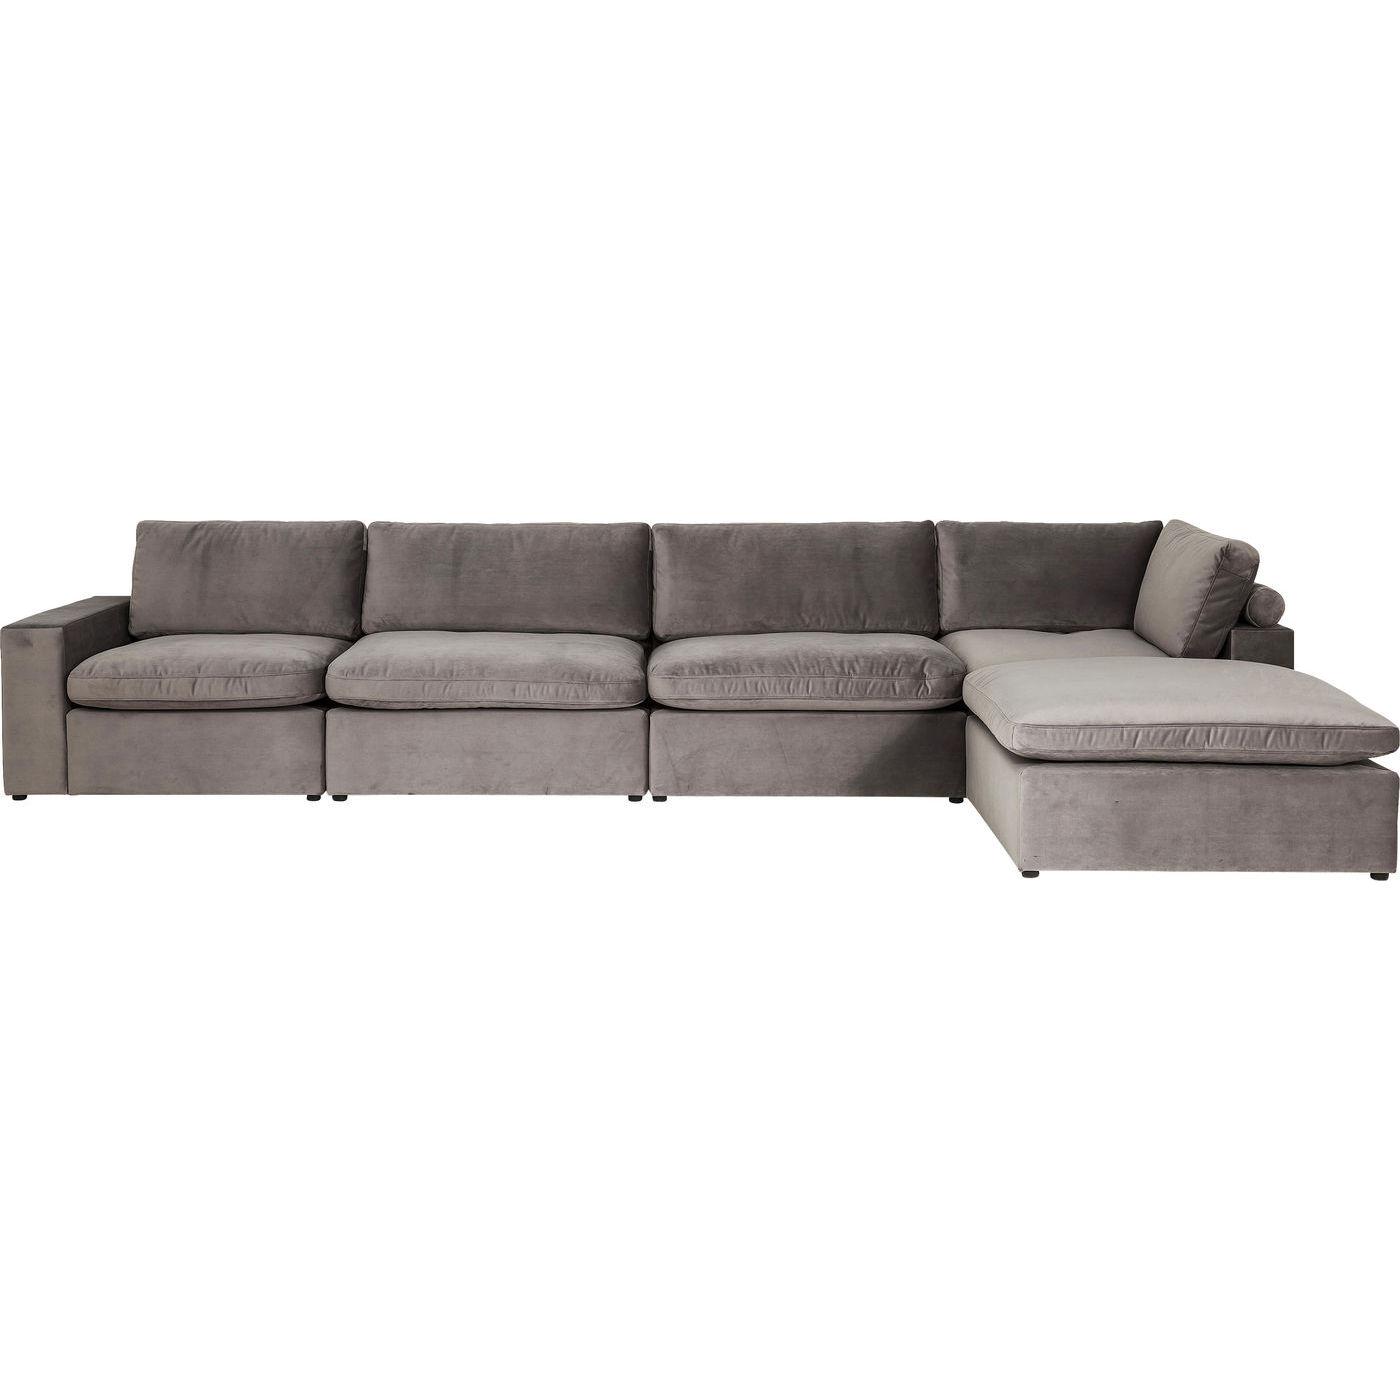 sofa lagos silbergrau m bel24. Black Bedroom Furniture Sets. Home Design Ideas